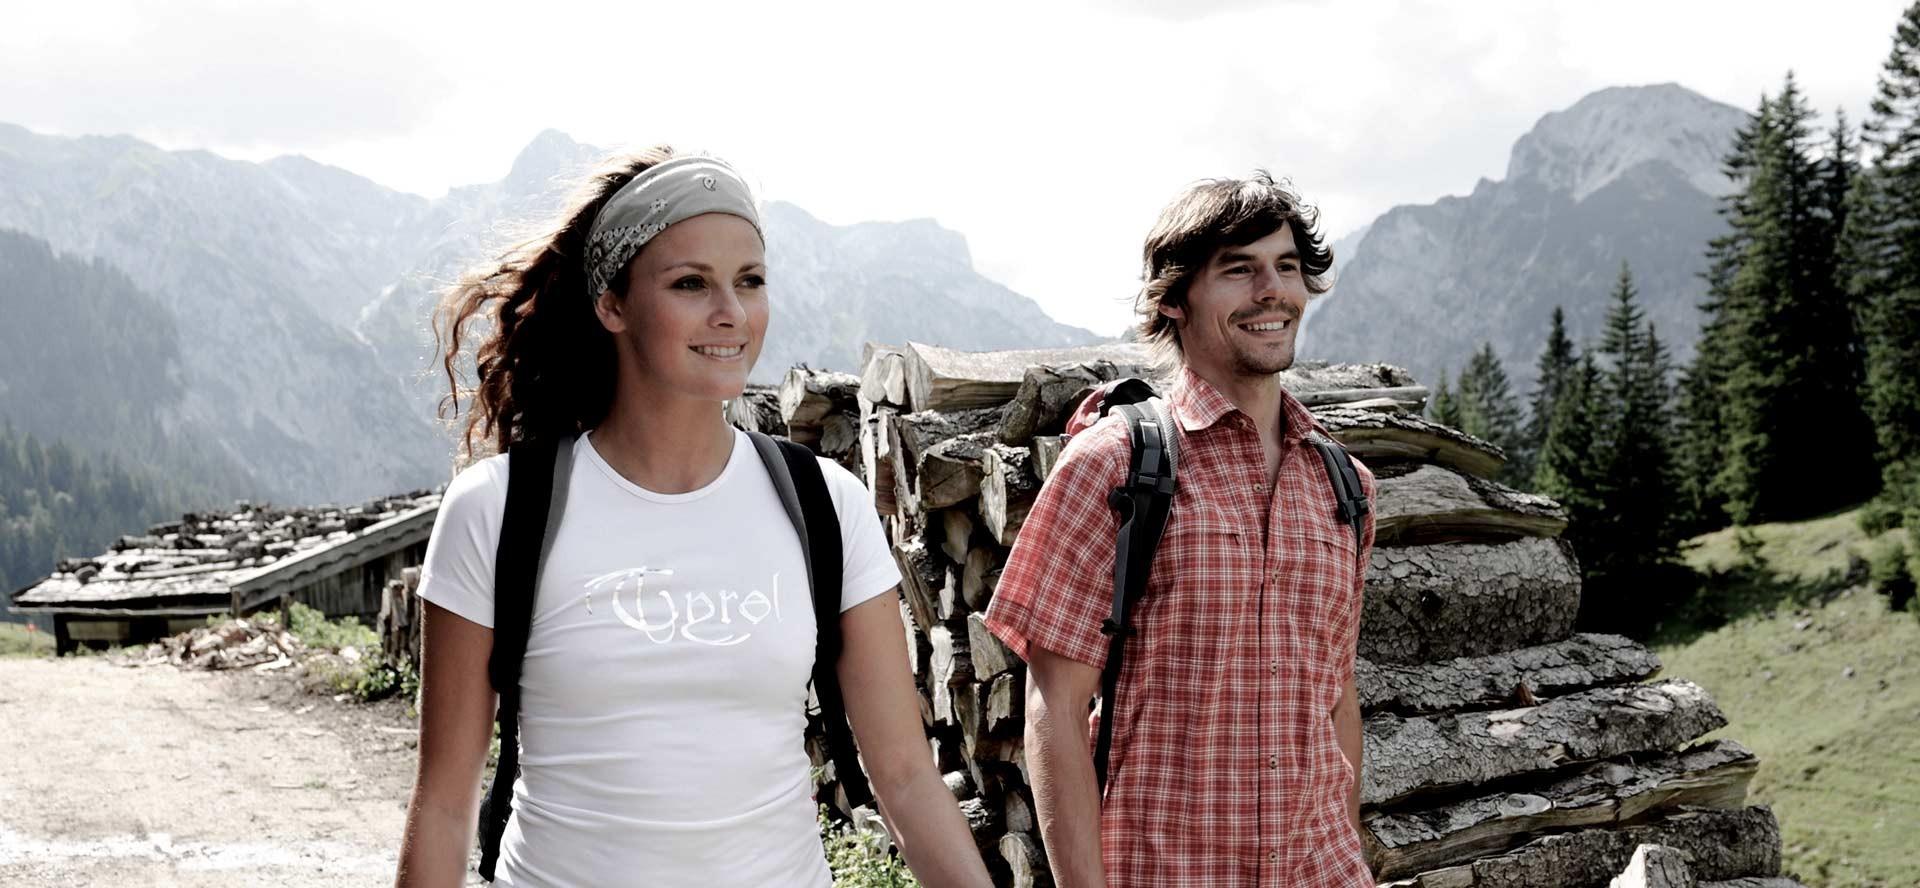 Sommerurlaub Tirol